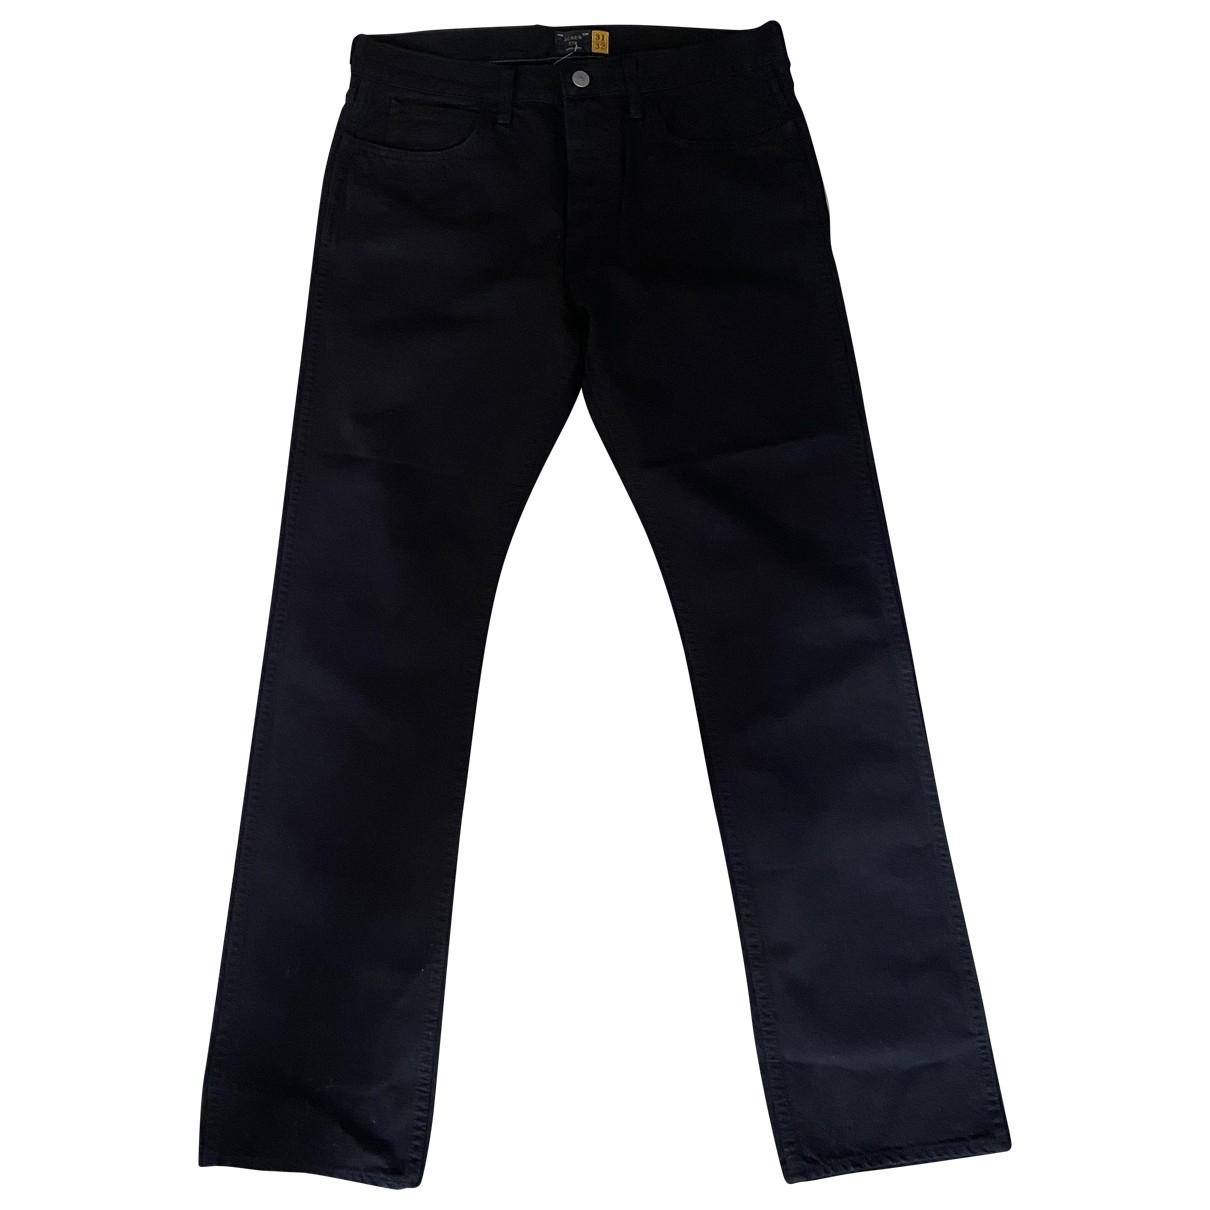 J.crew \N Black Jeans for Men 32 US